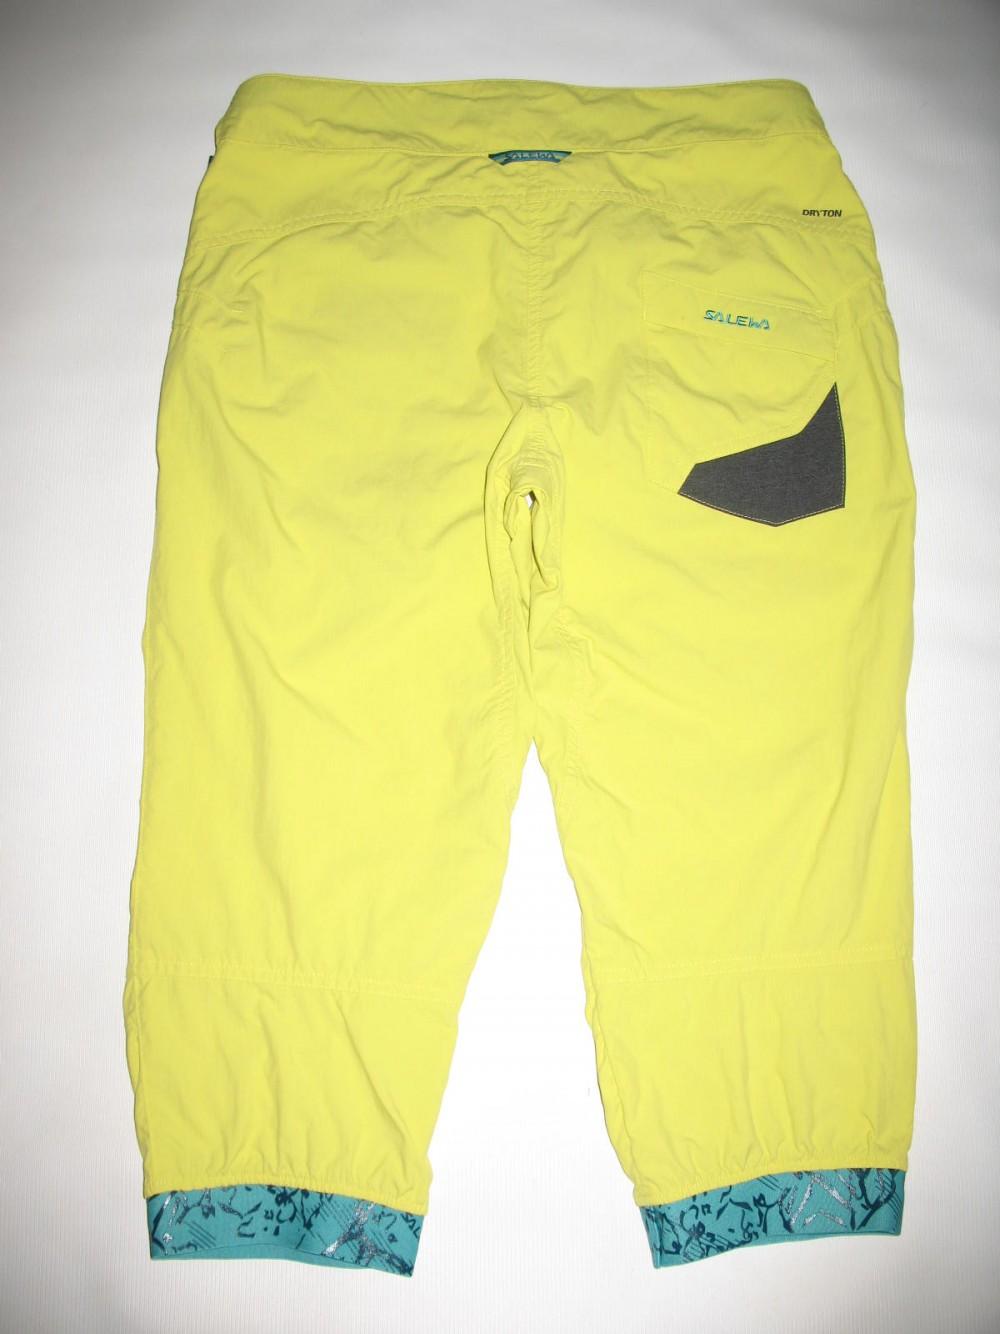 Штаны SALEWA rhytmo dry 3/4 pant lady (размер М) - 2